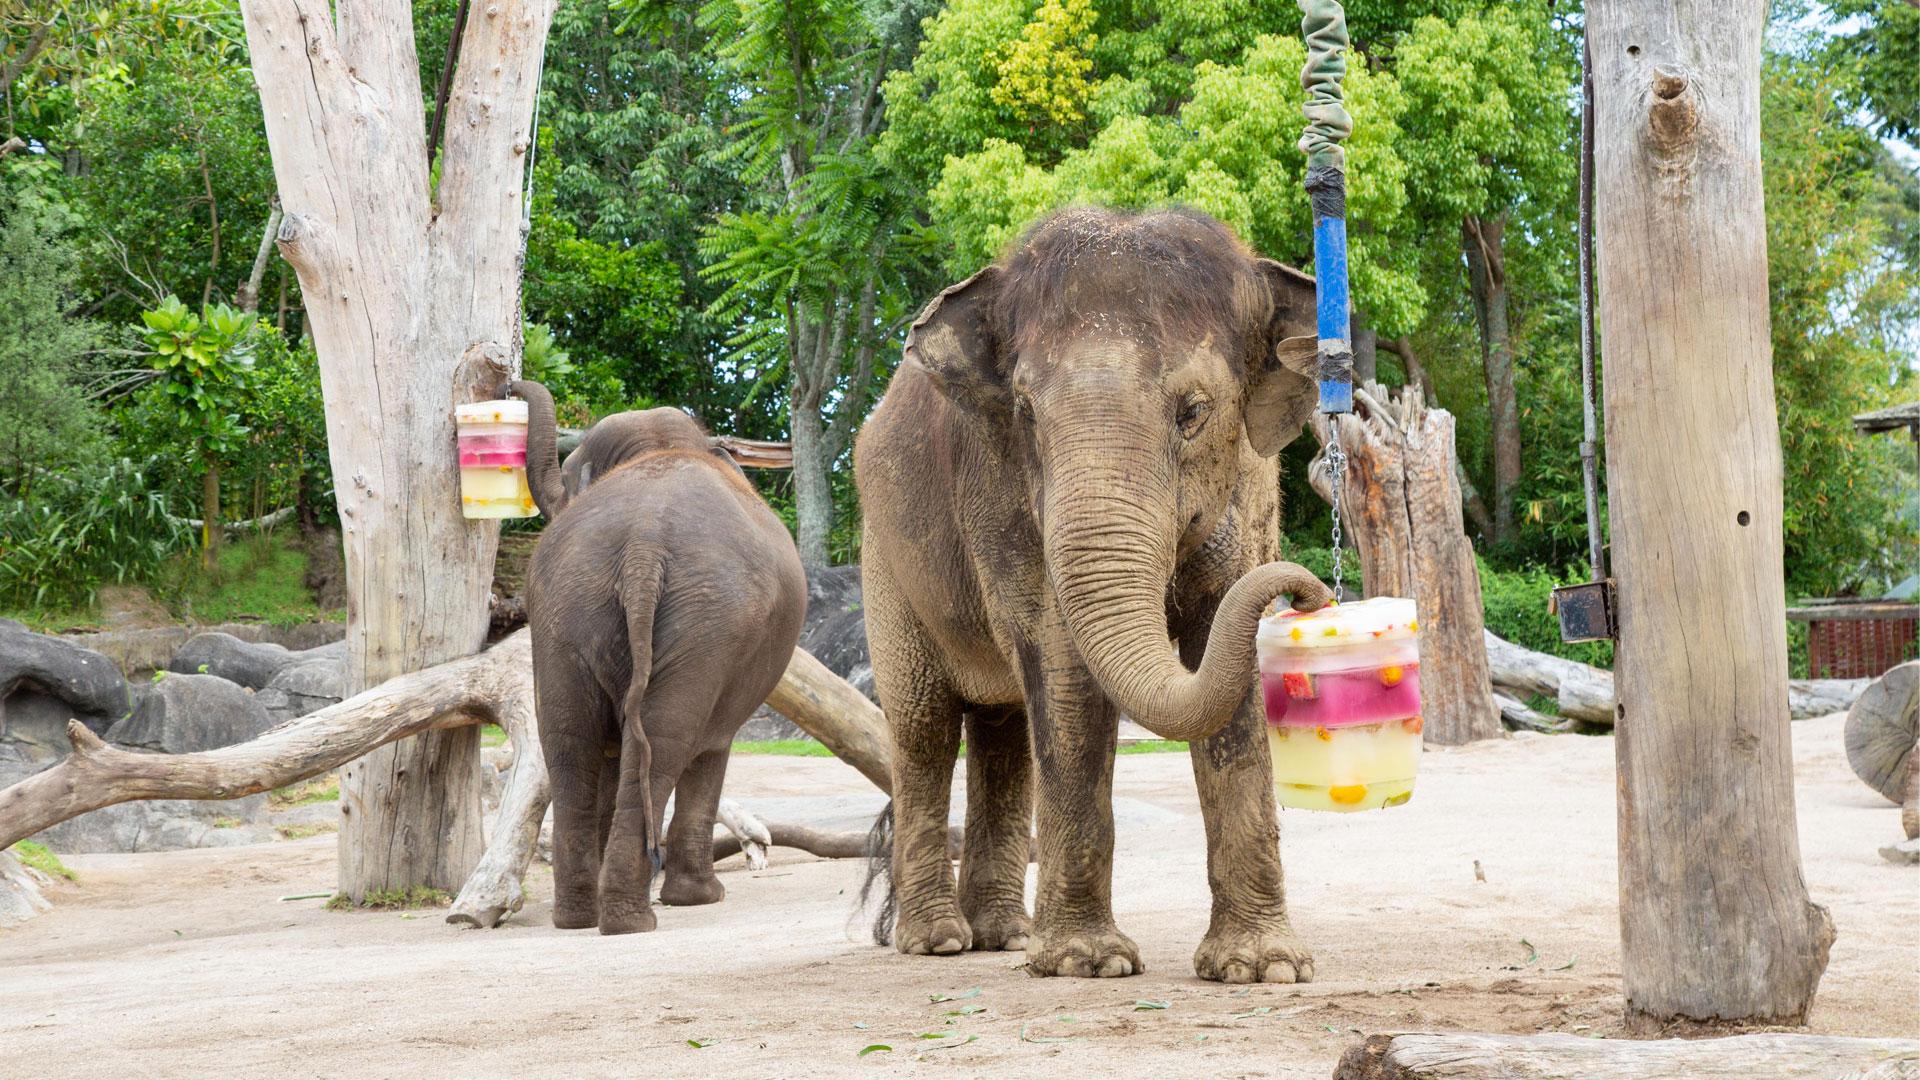 https://rfacdn.nz/zoo/assets/media/elephant-news-gallery-9.jpg